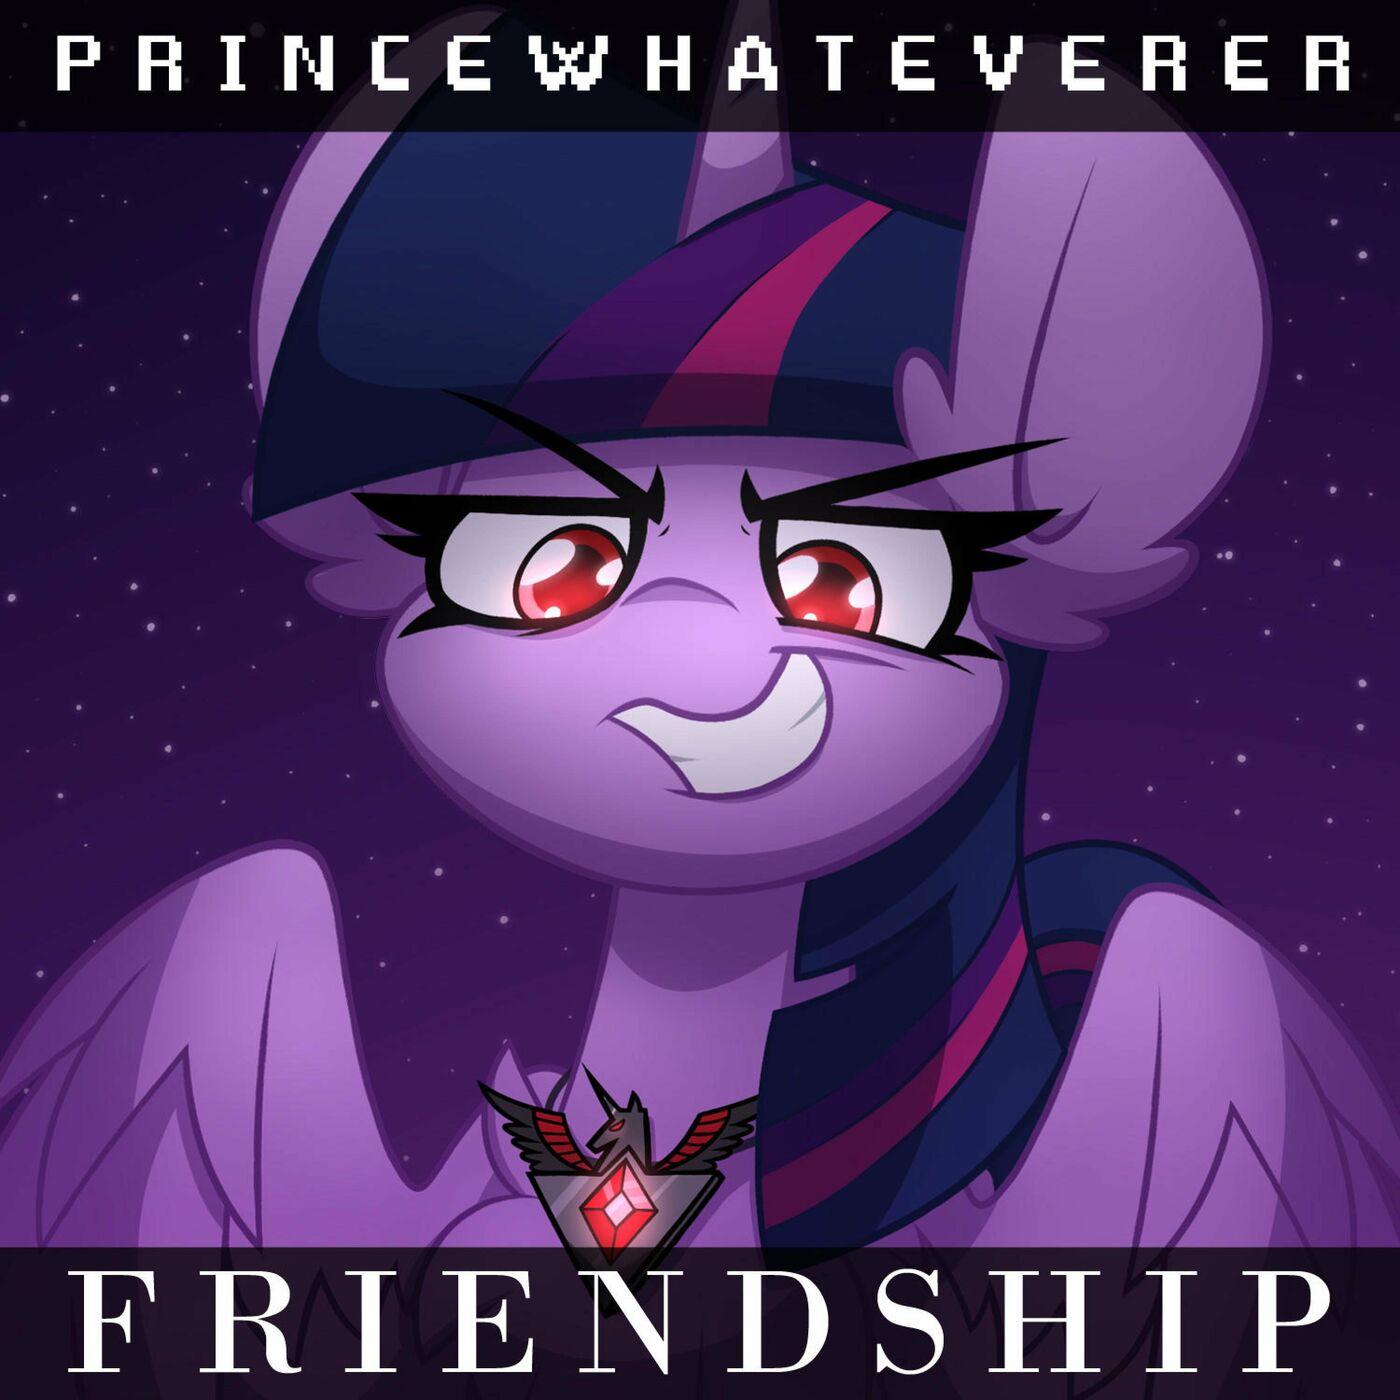 PrinceWhateverer - FRIENDSHIP [single] (2021)